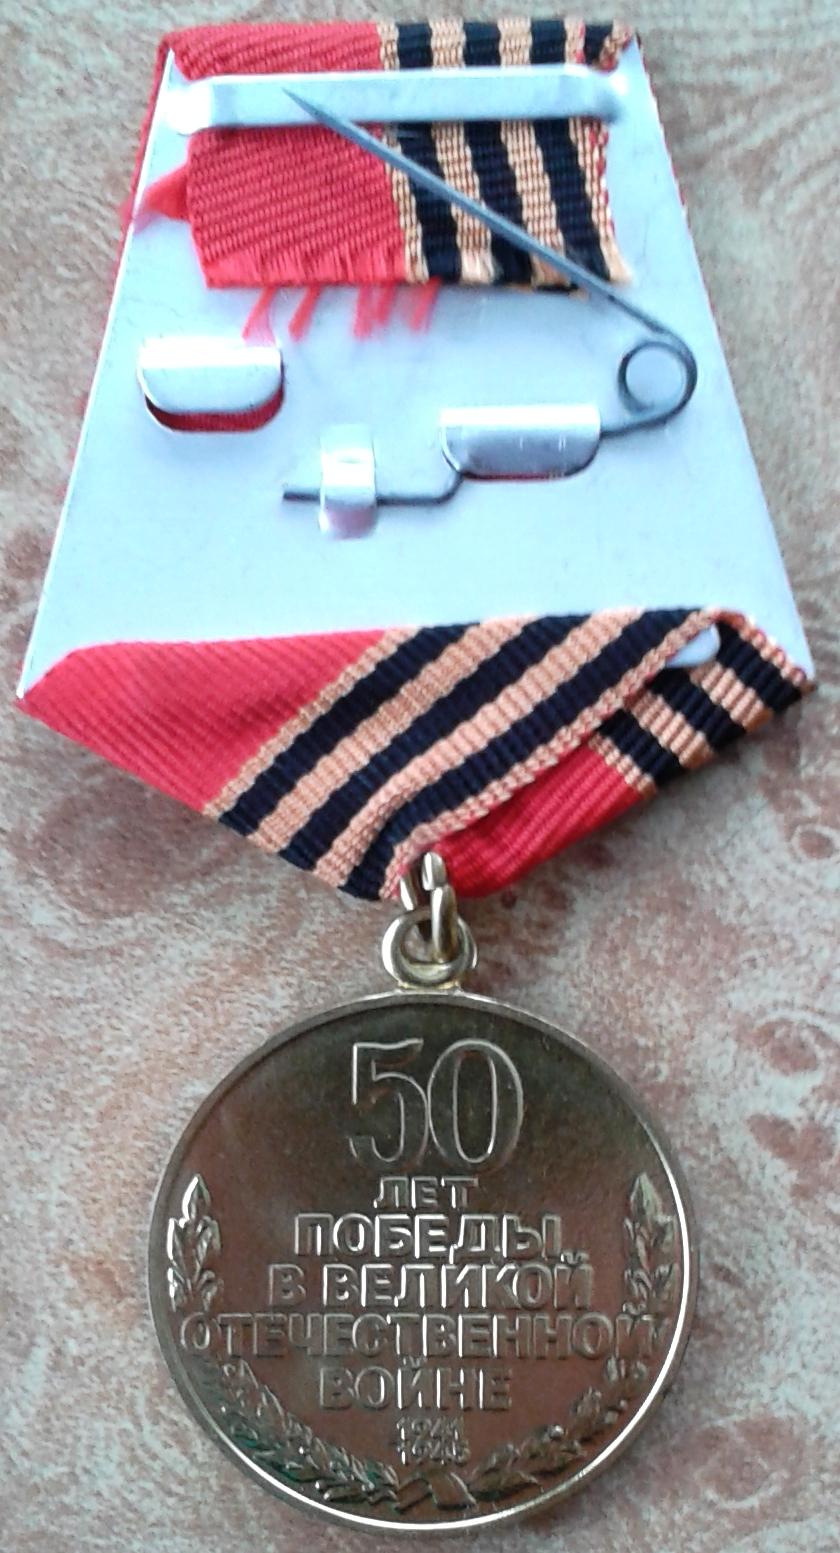 132. Медаль 50 лет Победы, Барыкина МГ, 1995